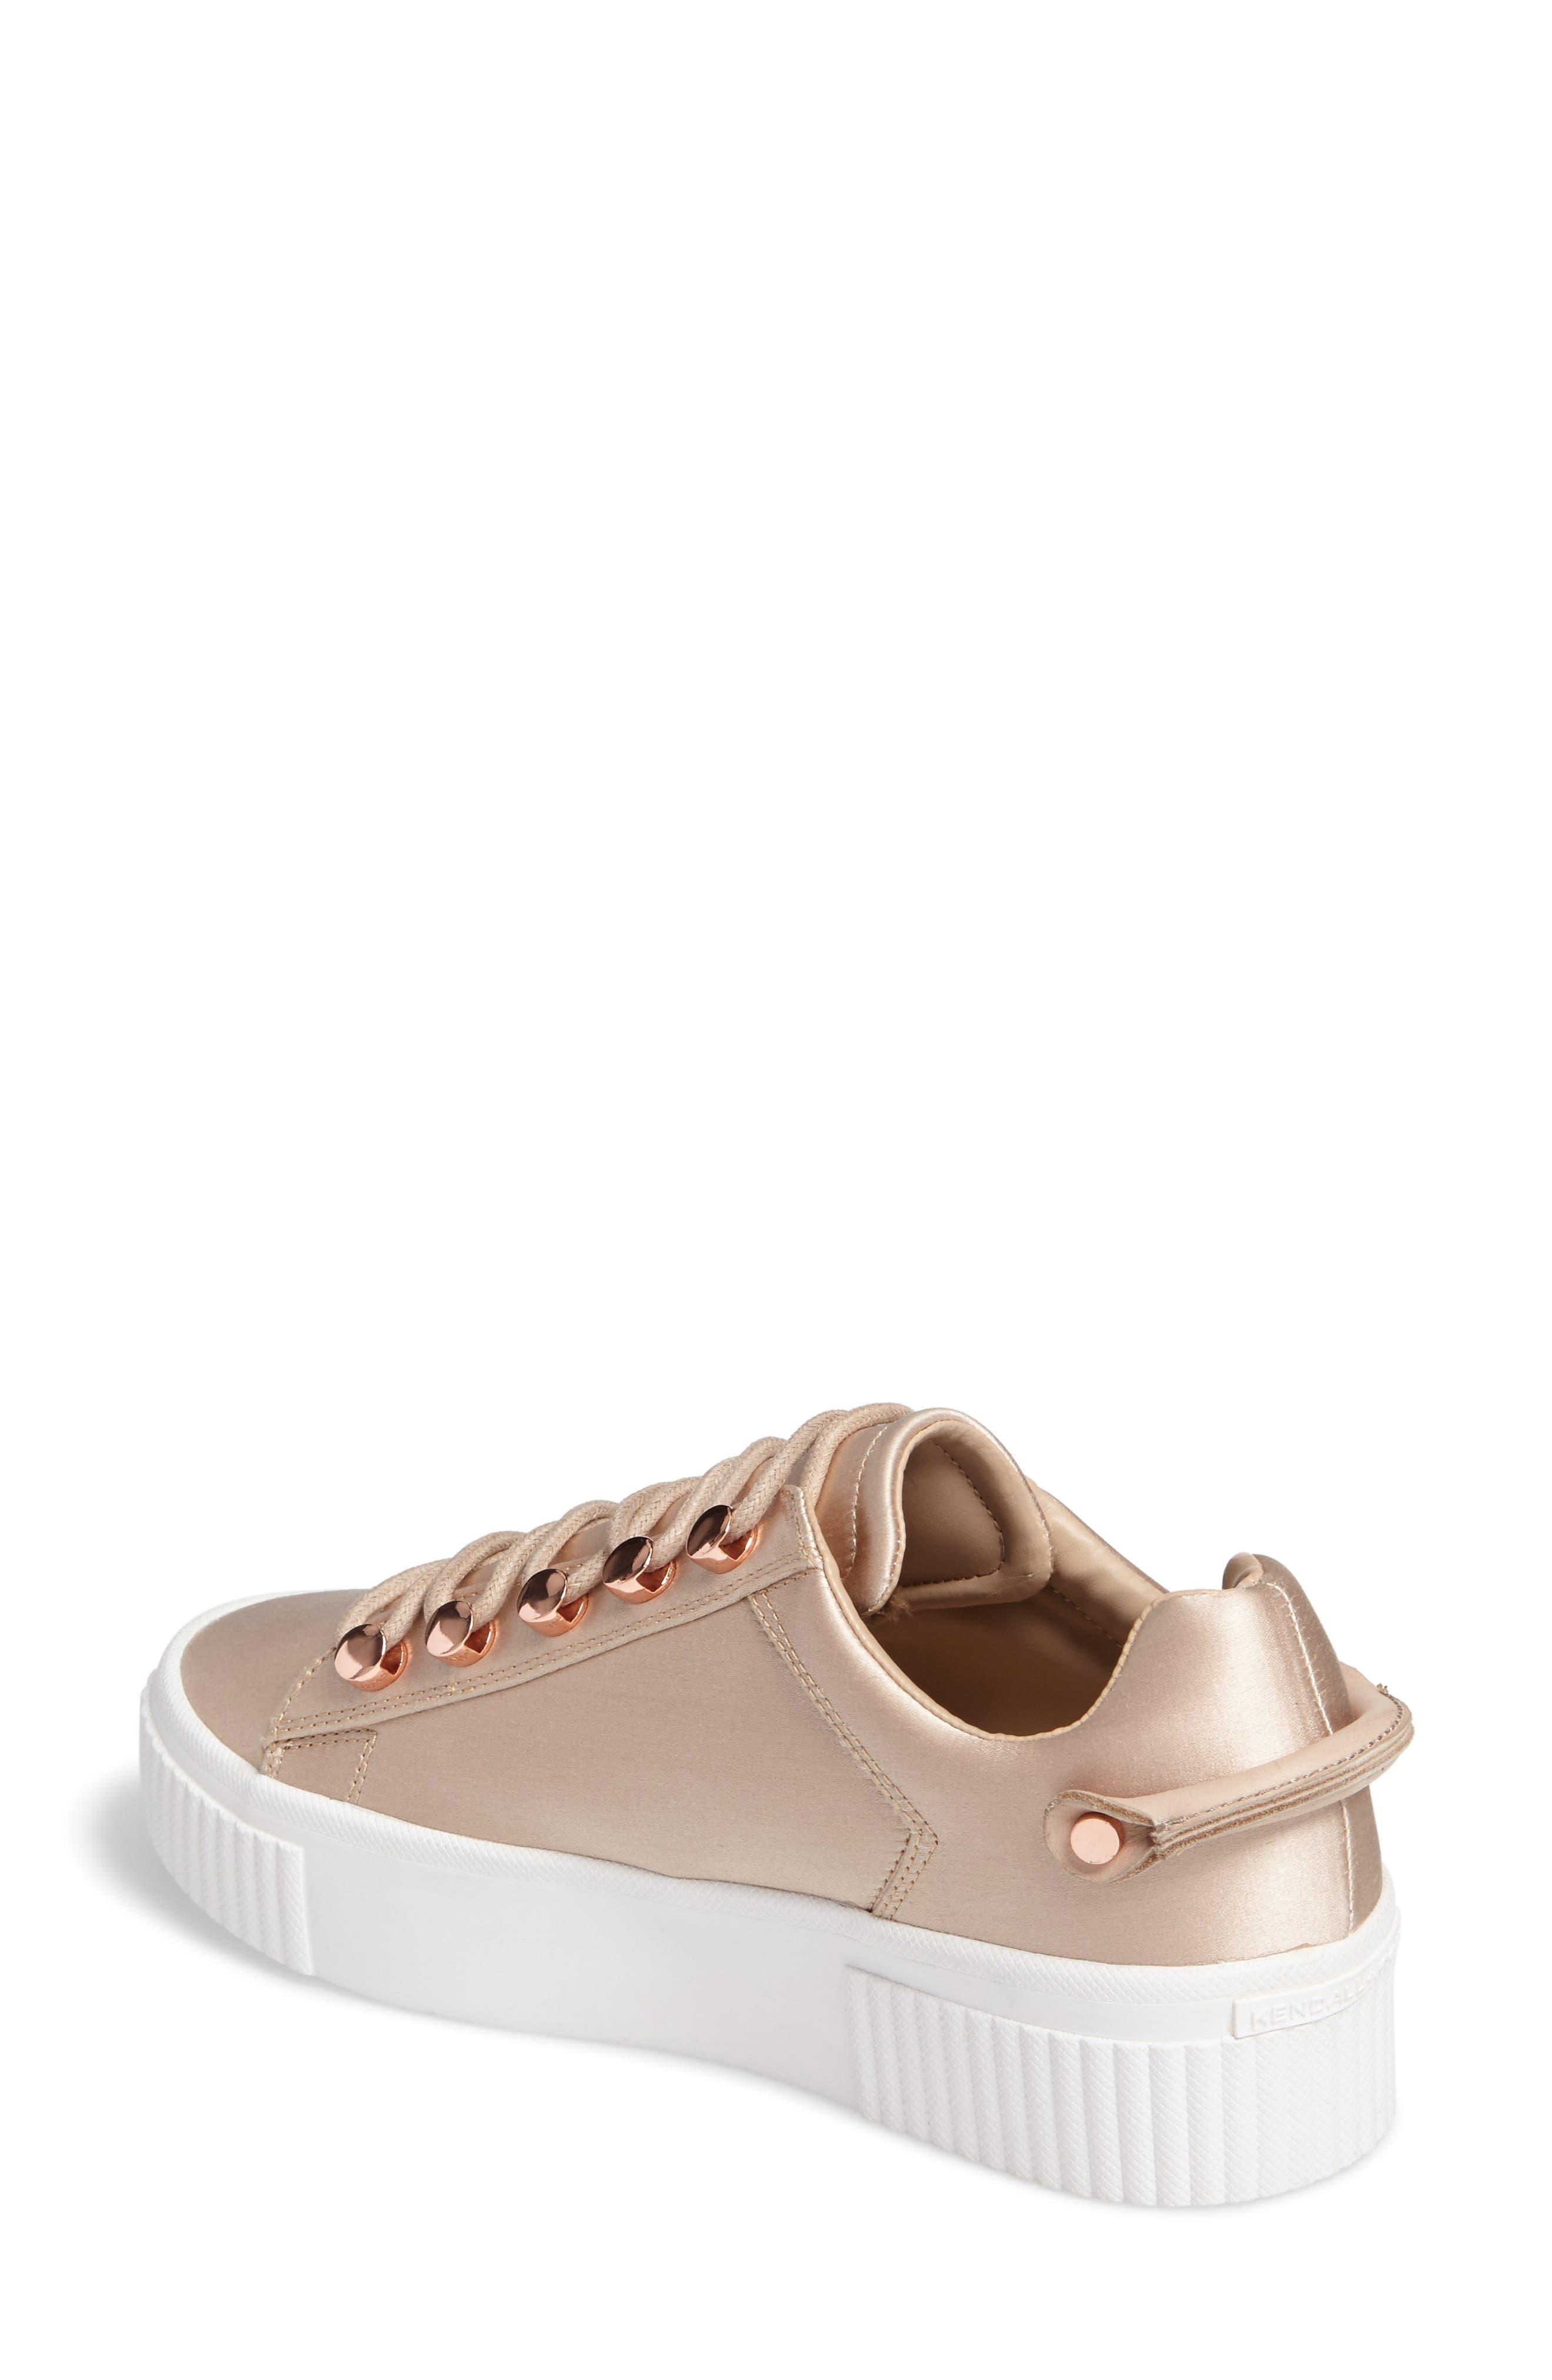 Rae 3 Platform Sneaker,                             Alternate thumbnail 2, color,                             683